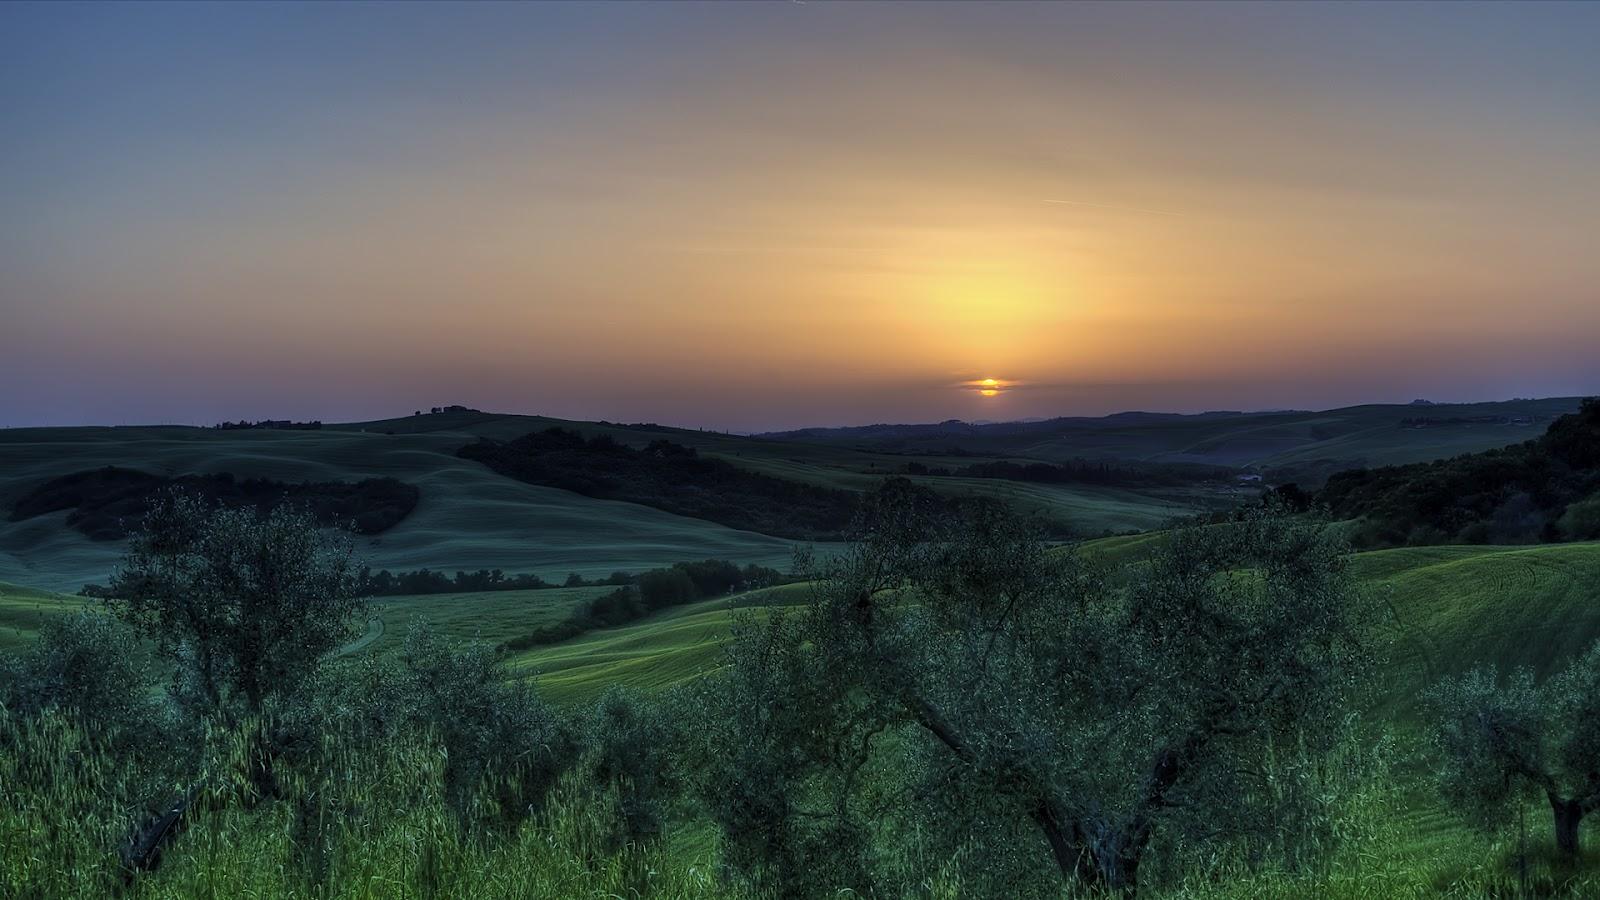 HD Sunset Wallpapers Nature Background for Laptop Desktop Widescreen 1600x900